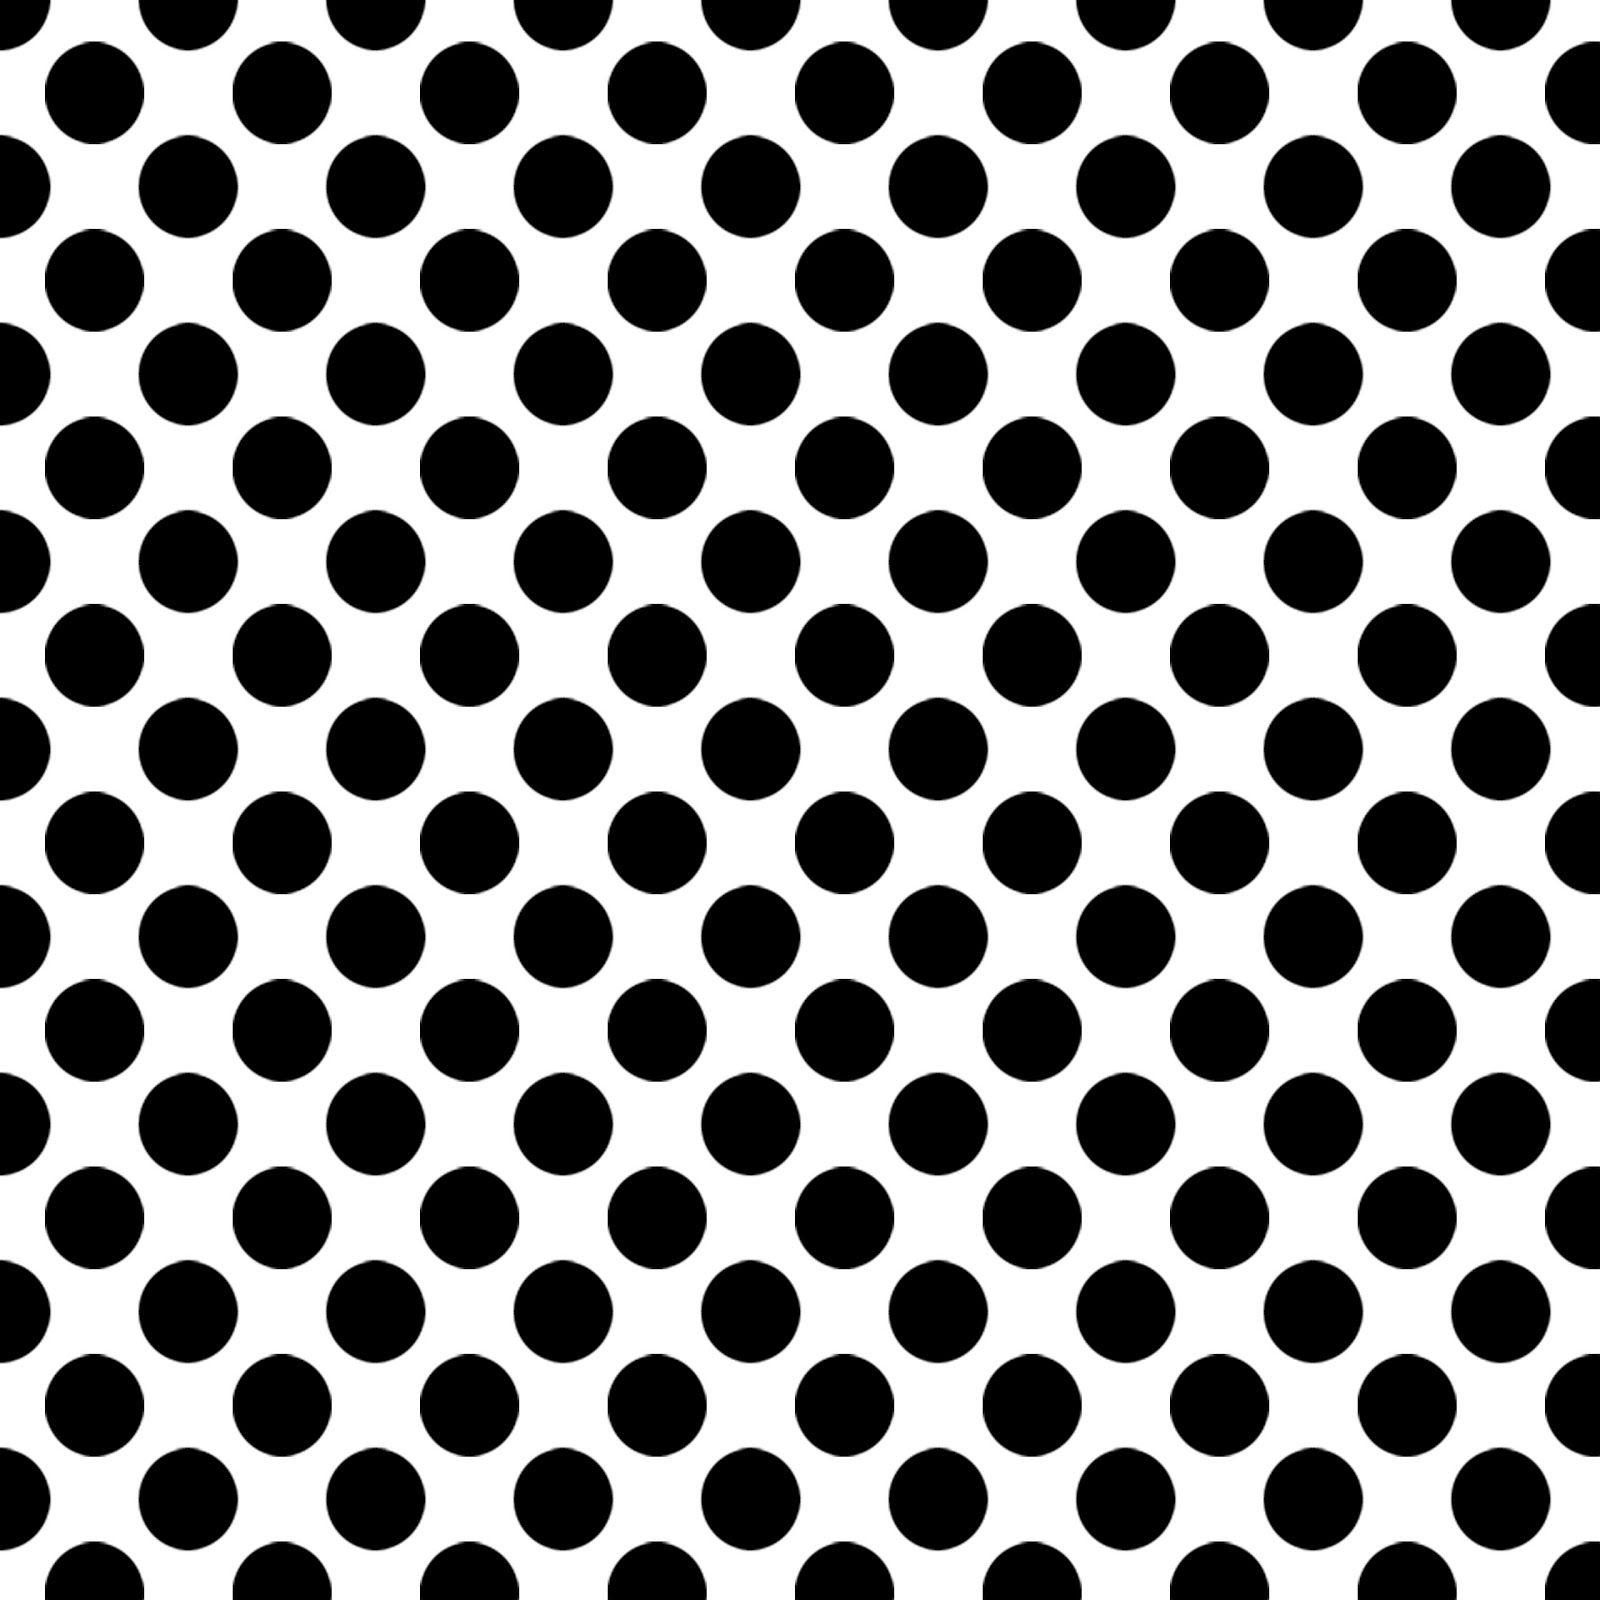 Scrapbook ideas black background - Free Digital Backgrounds Scrapbook Paper Black And White Spots Dots